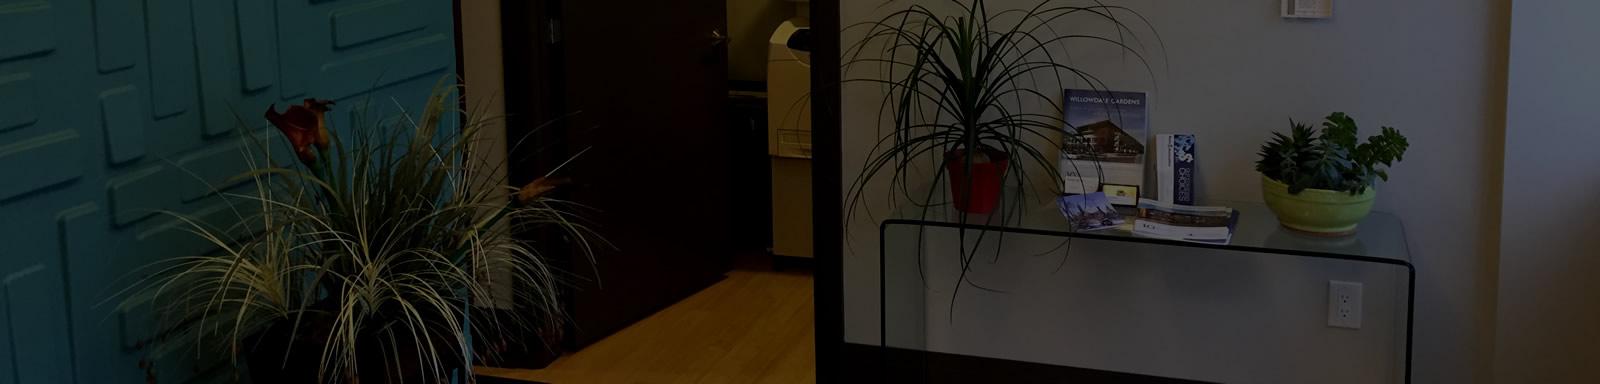 marks-associates-office1